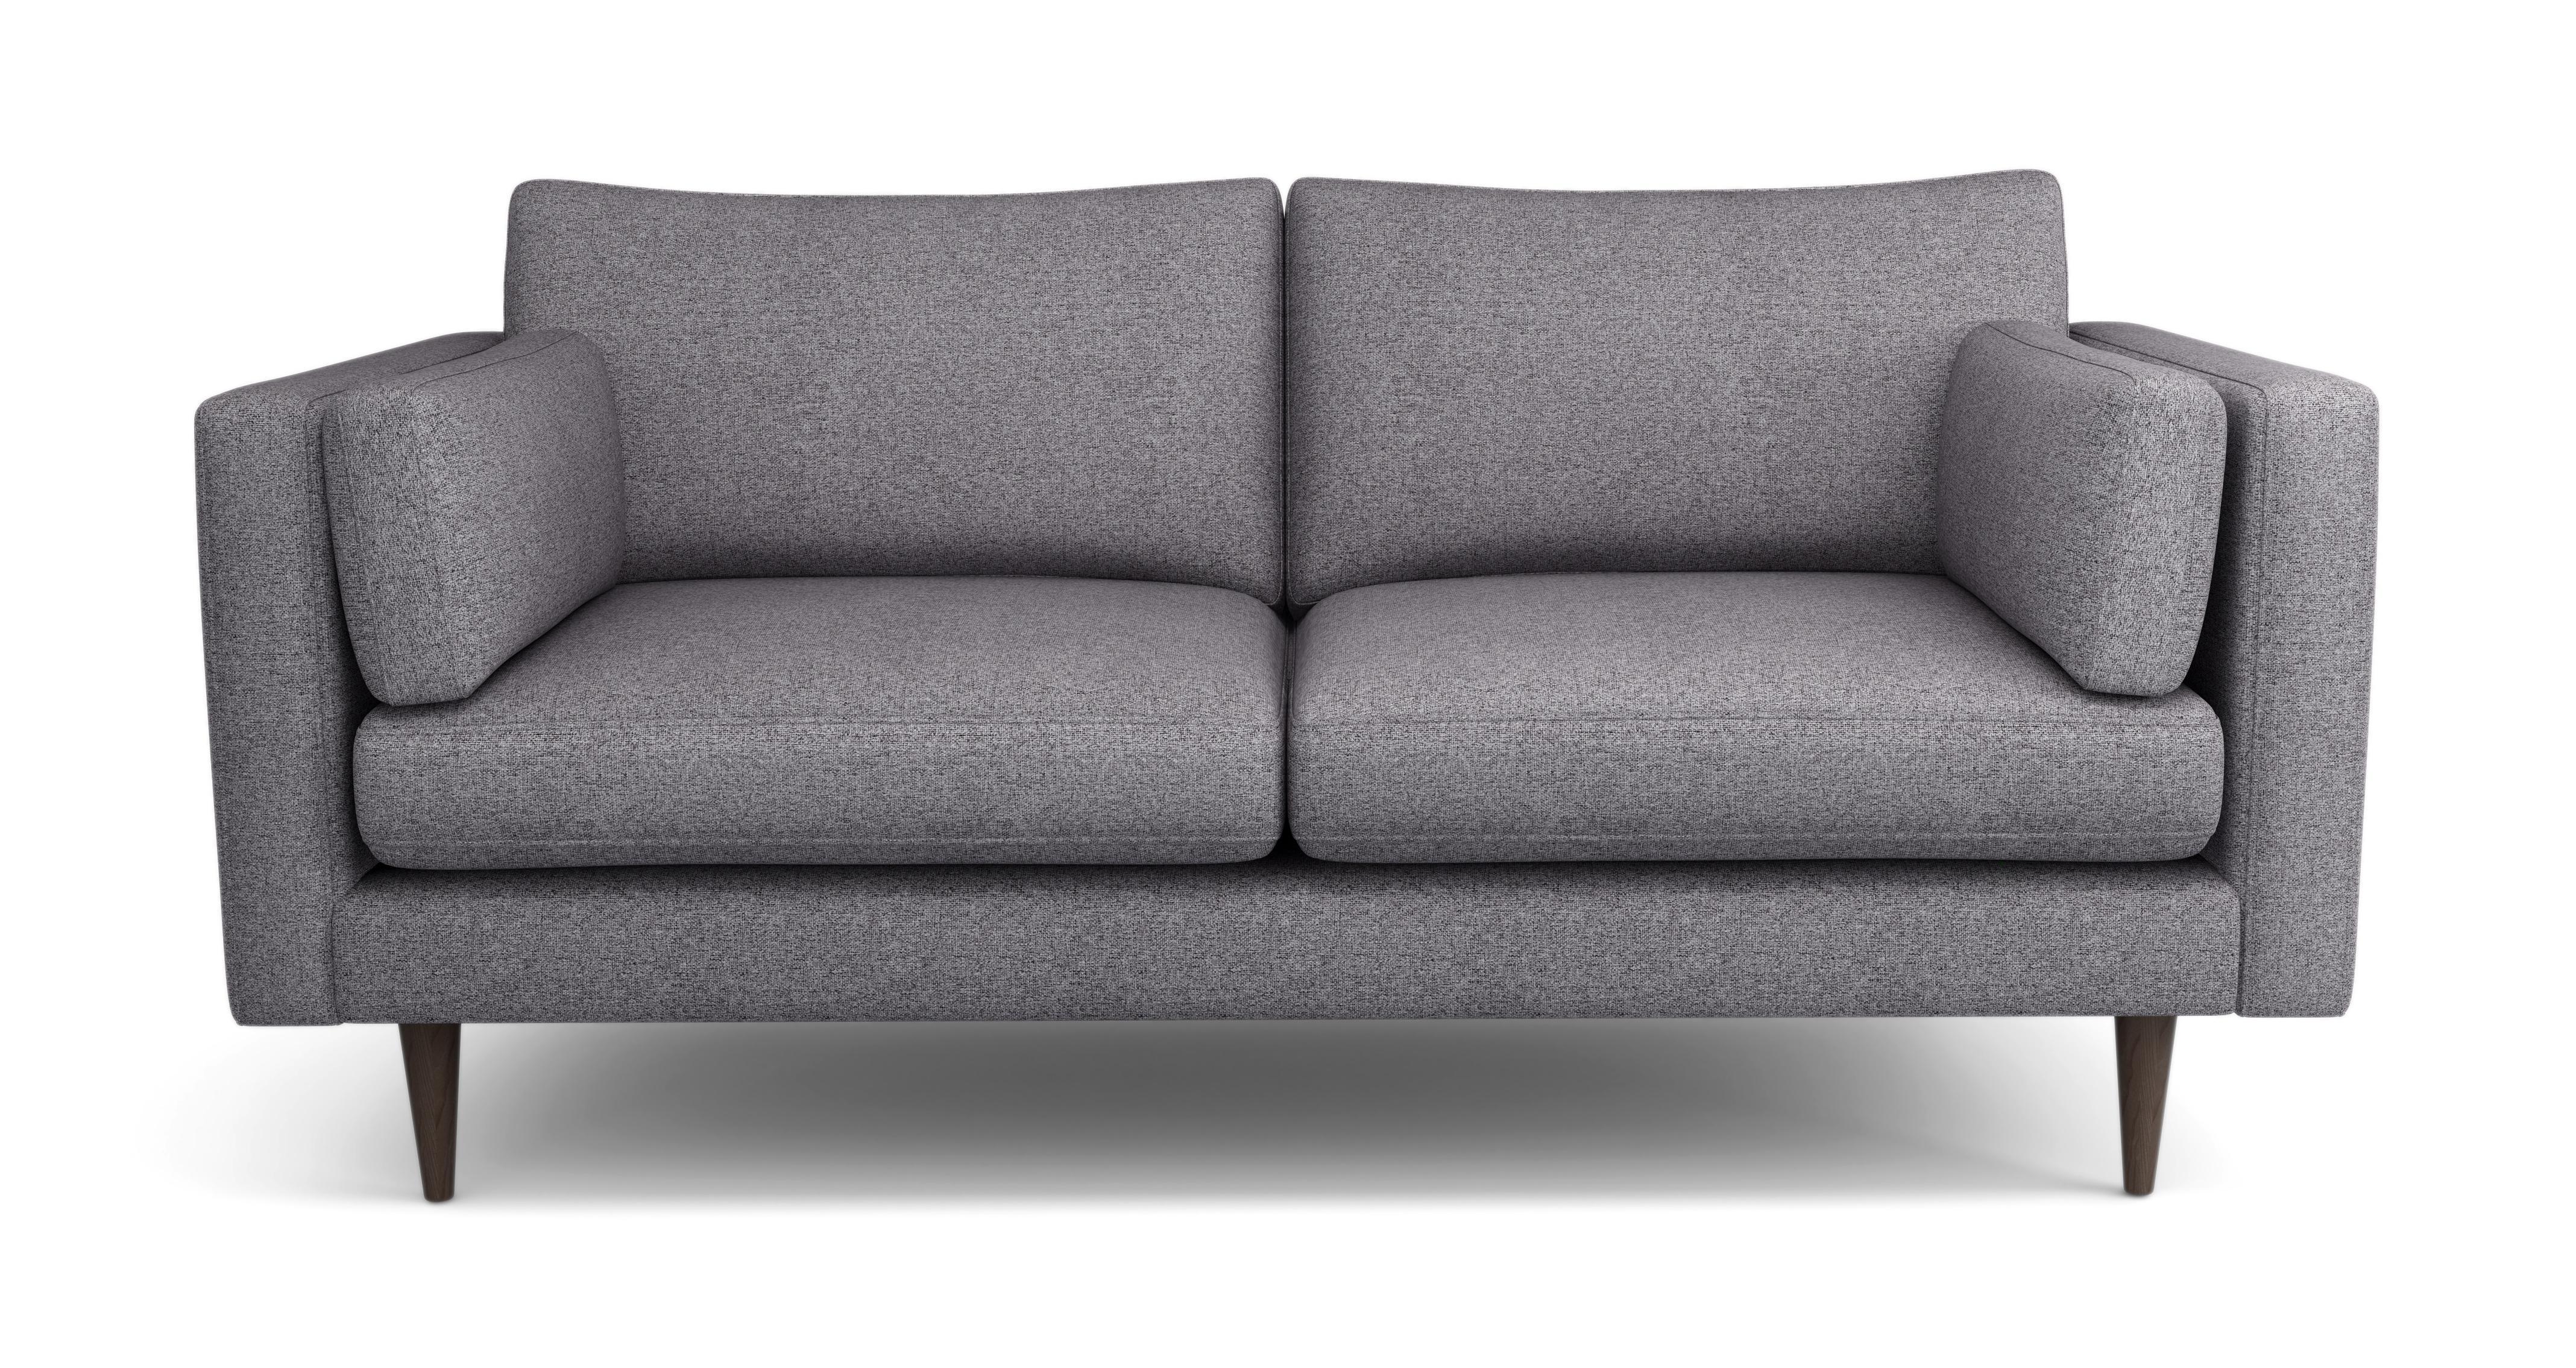 Marl Fabric 3 Seater Sofa Marl Plain Dfs Ireland